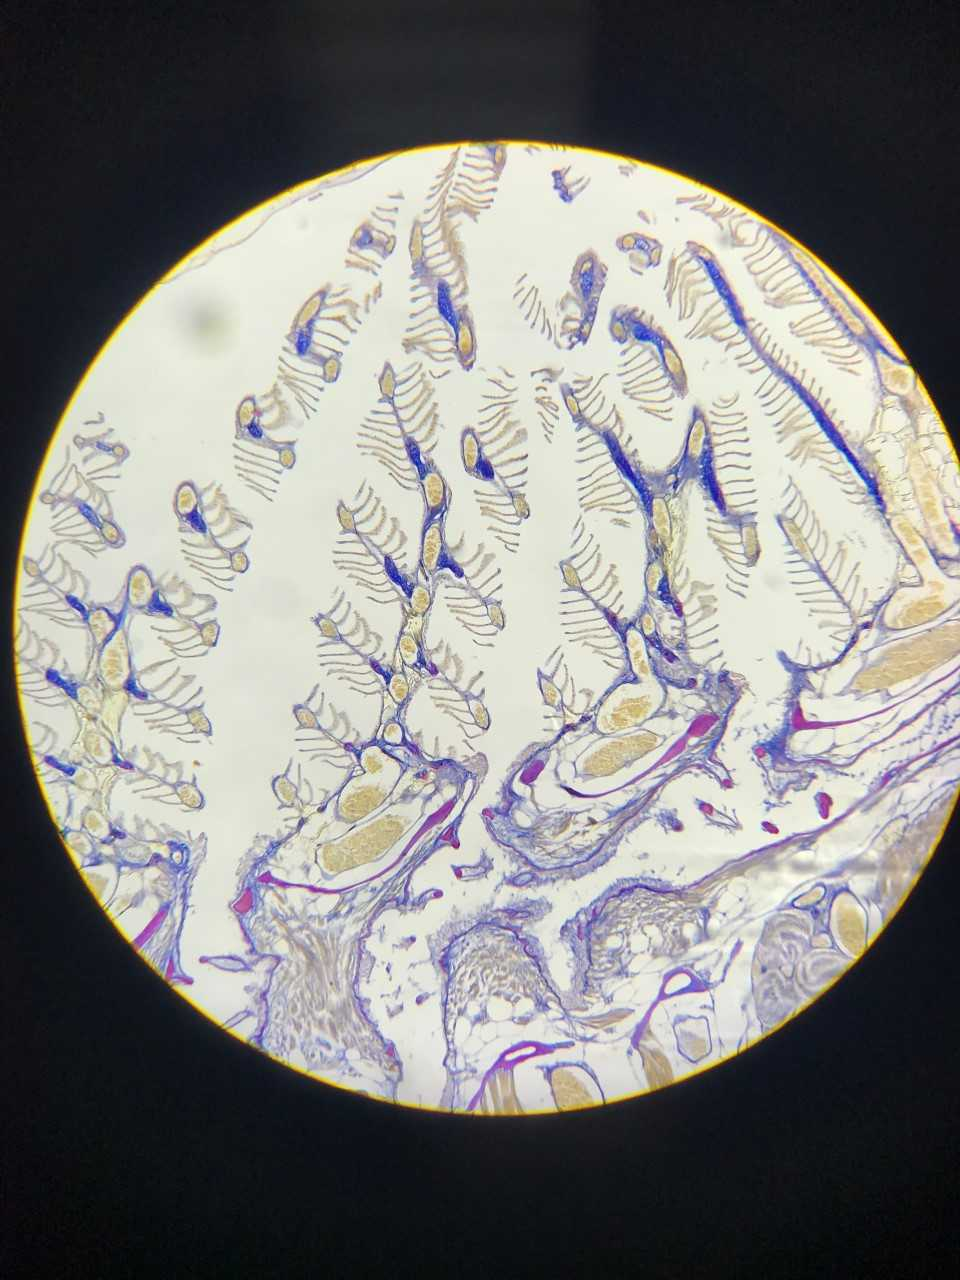 Gills under microscope